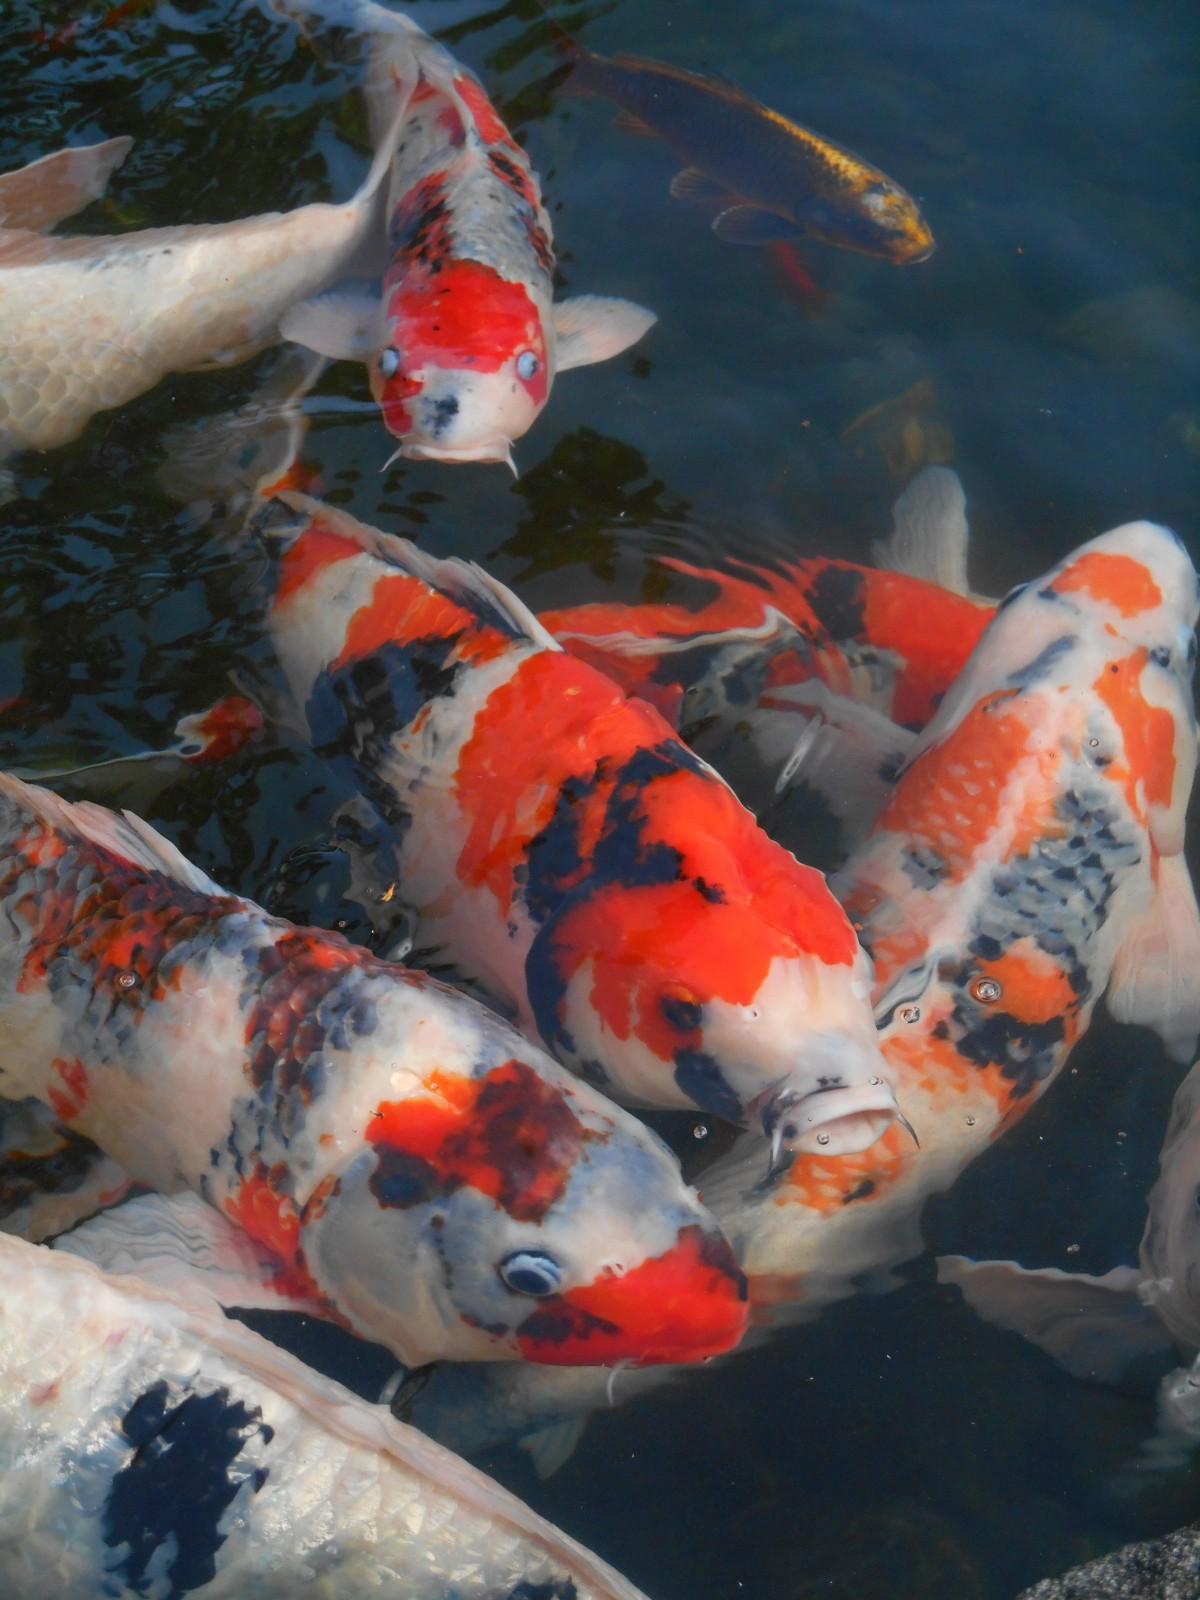 Free Images : pond, japan, vivid, koi, aquarium fish, colored carp ...